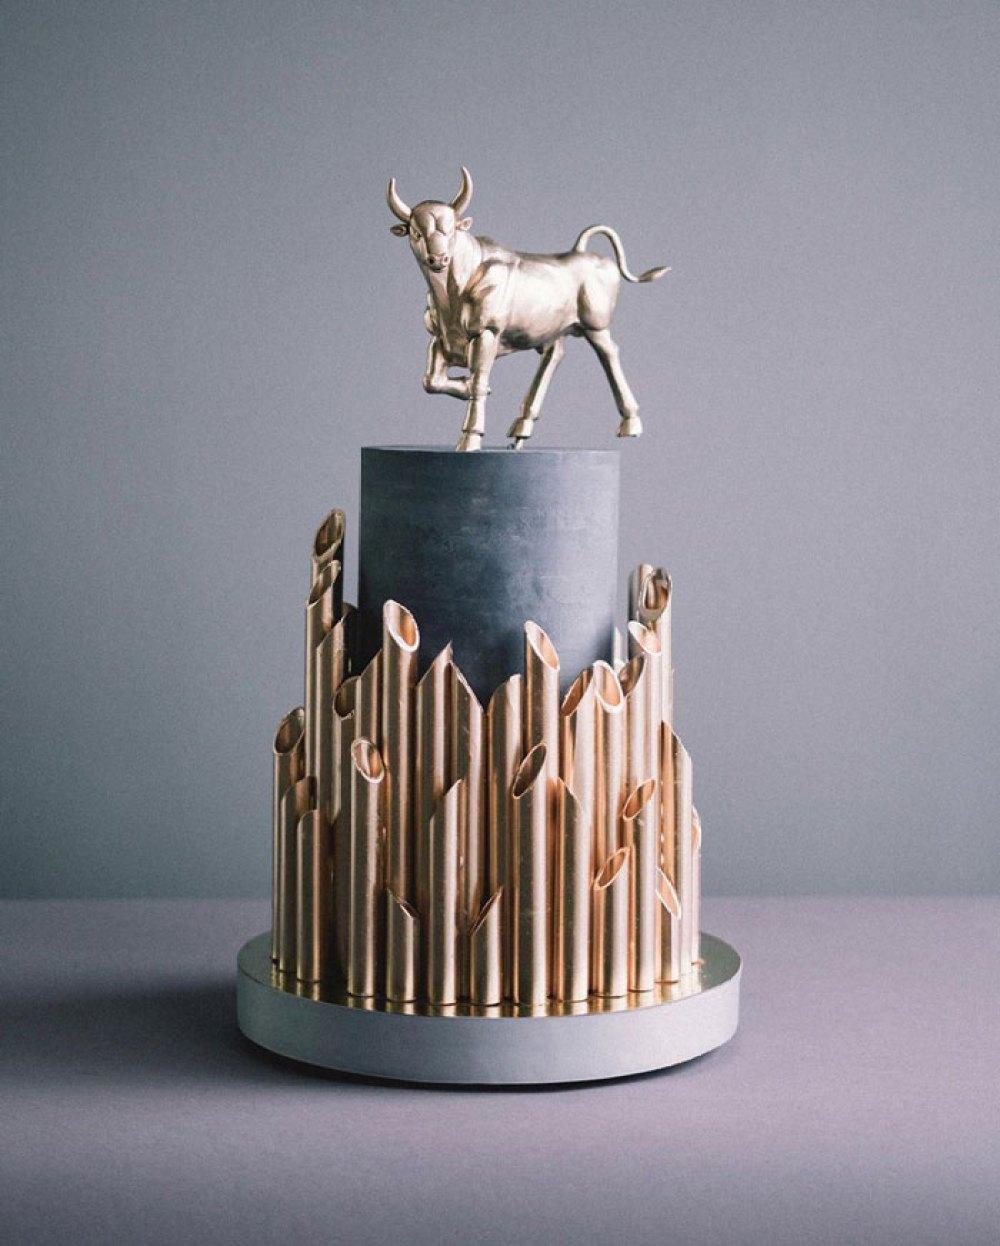 tortik-annushka-artistic-cakes-designs-15-5e82fde0b5eb6__700